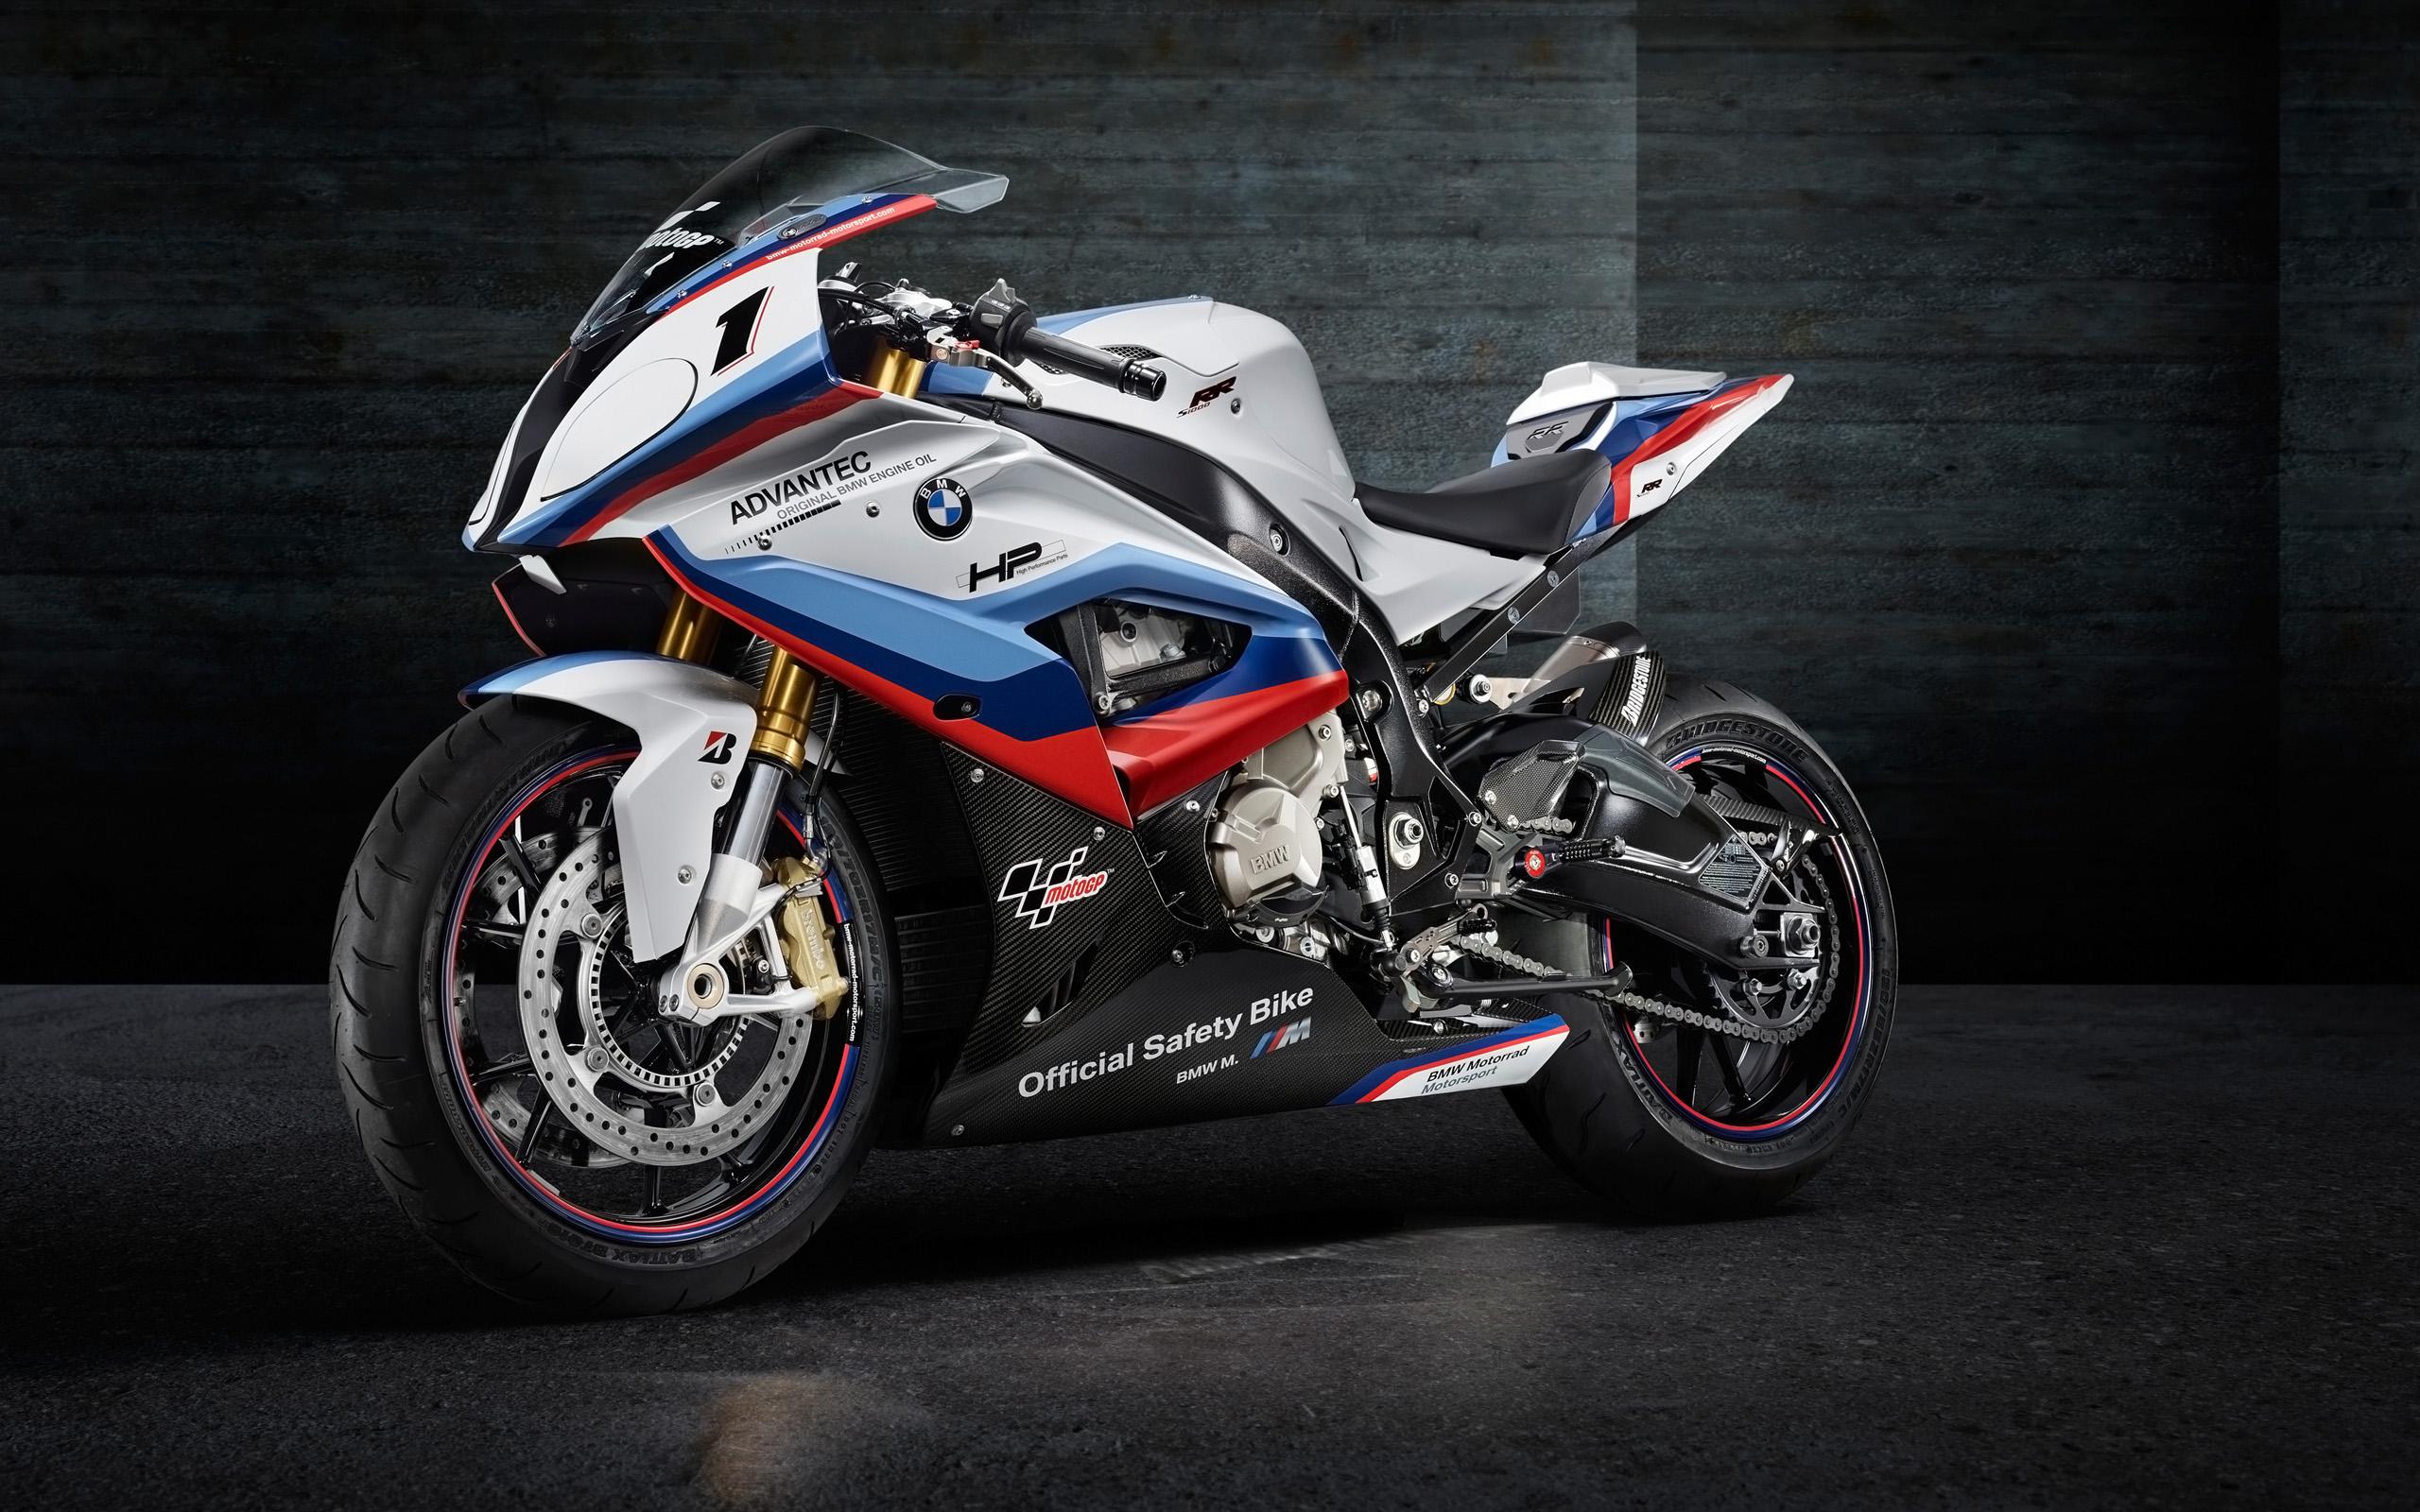 2015 BMW M4 MotoGP Safety Bike Wallpapers HD Wallpapers 2560x1600